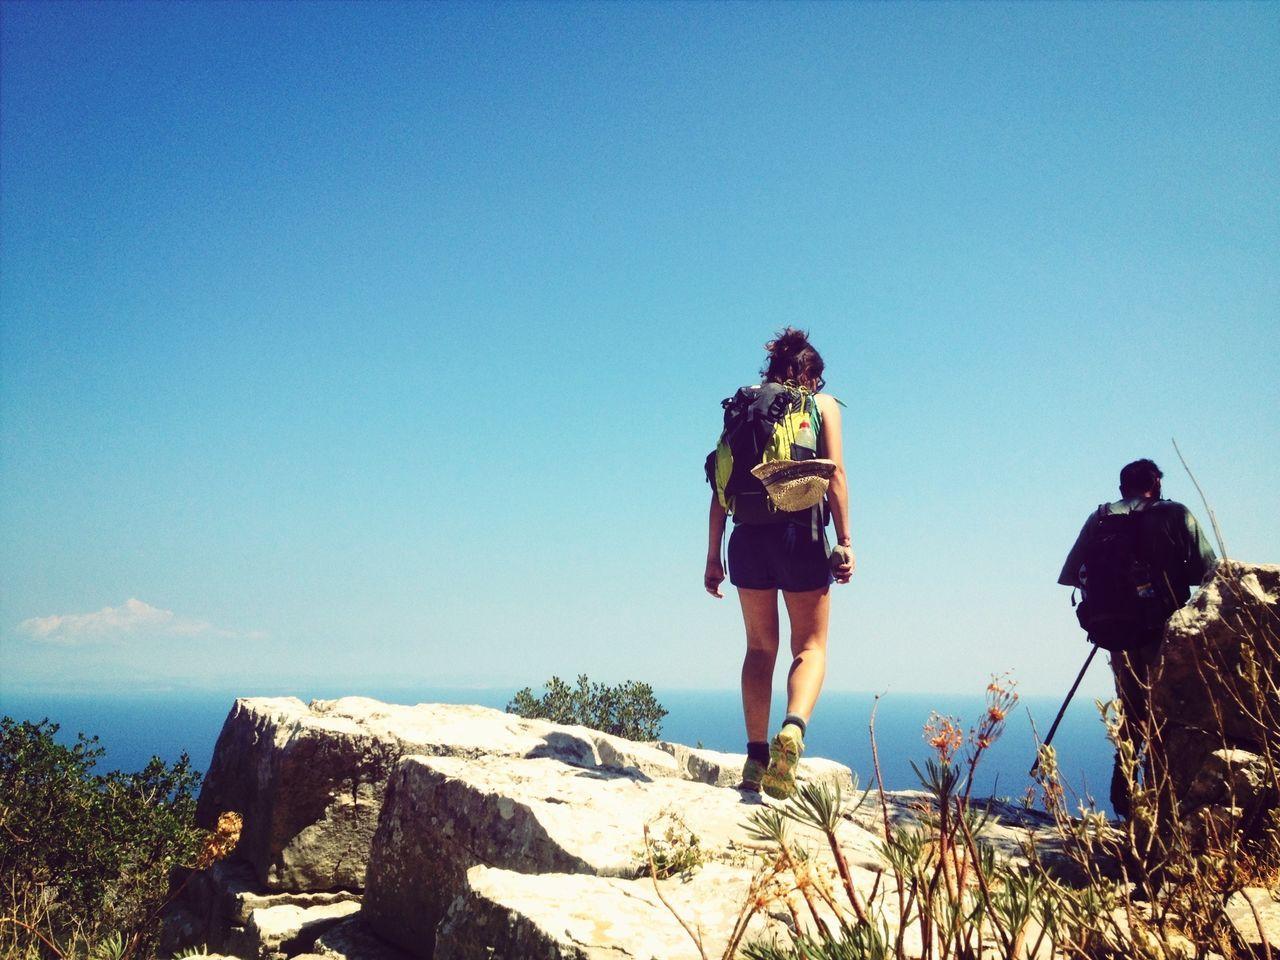 trekking with friends at the horizon Trekking Climbing Great Views Enjoying Life